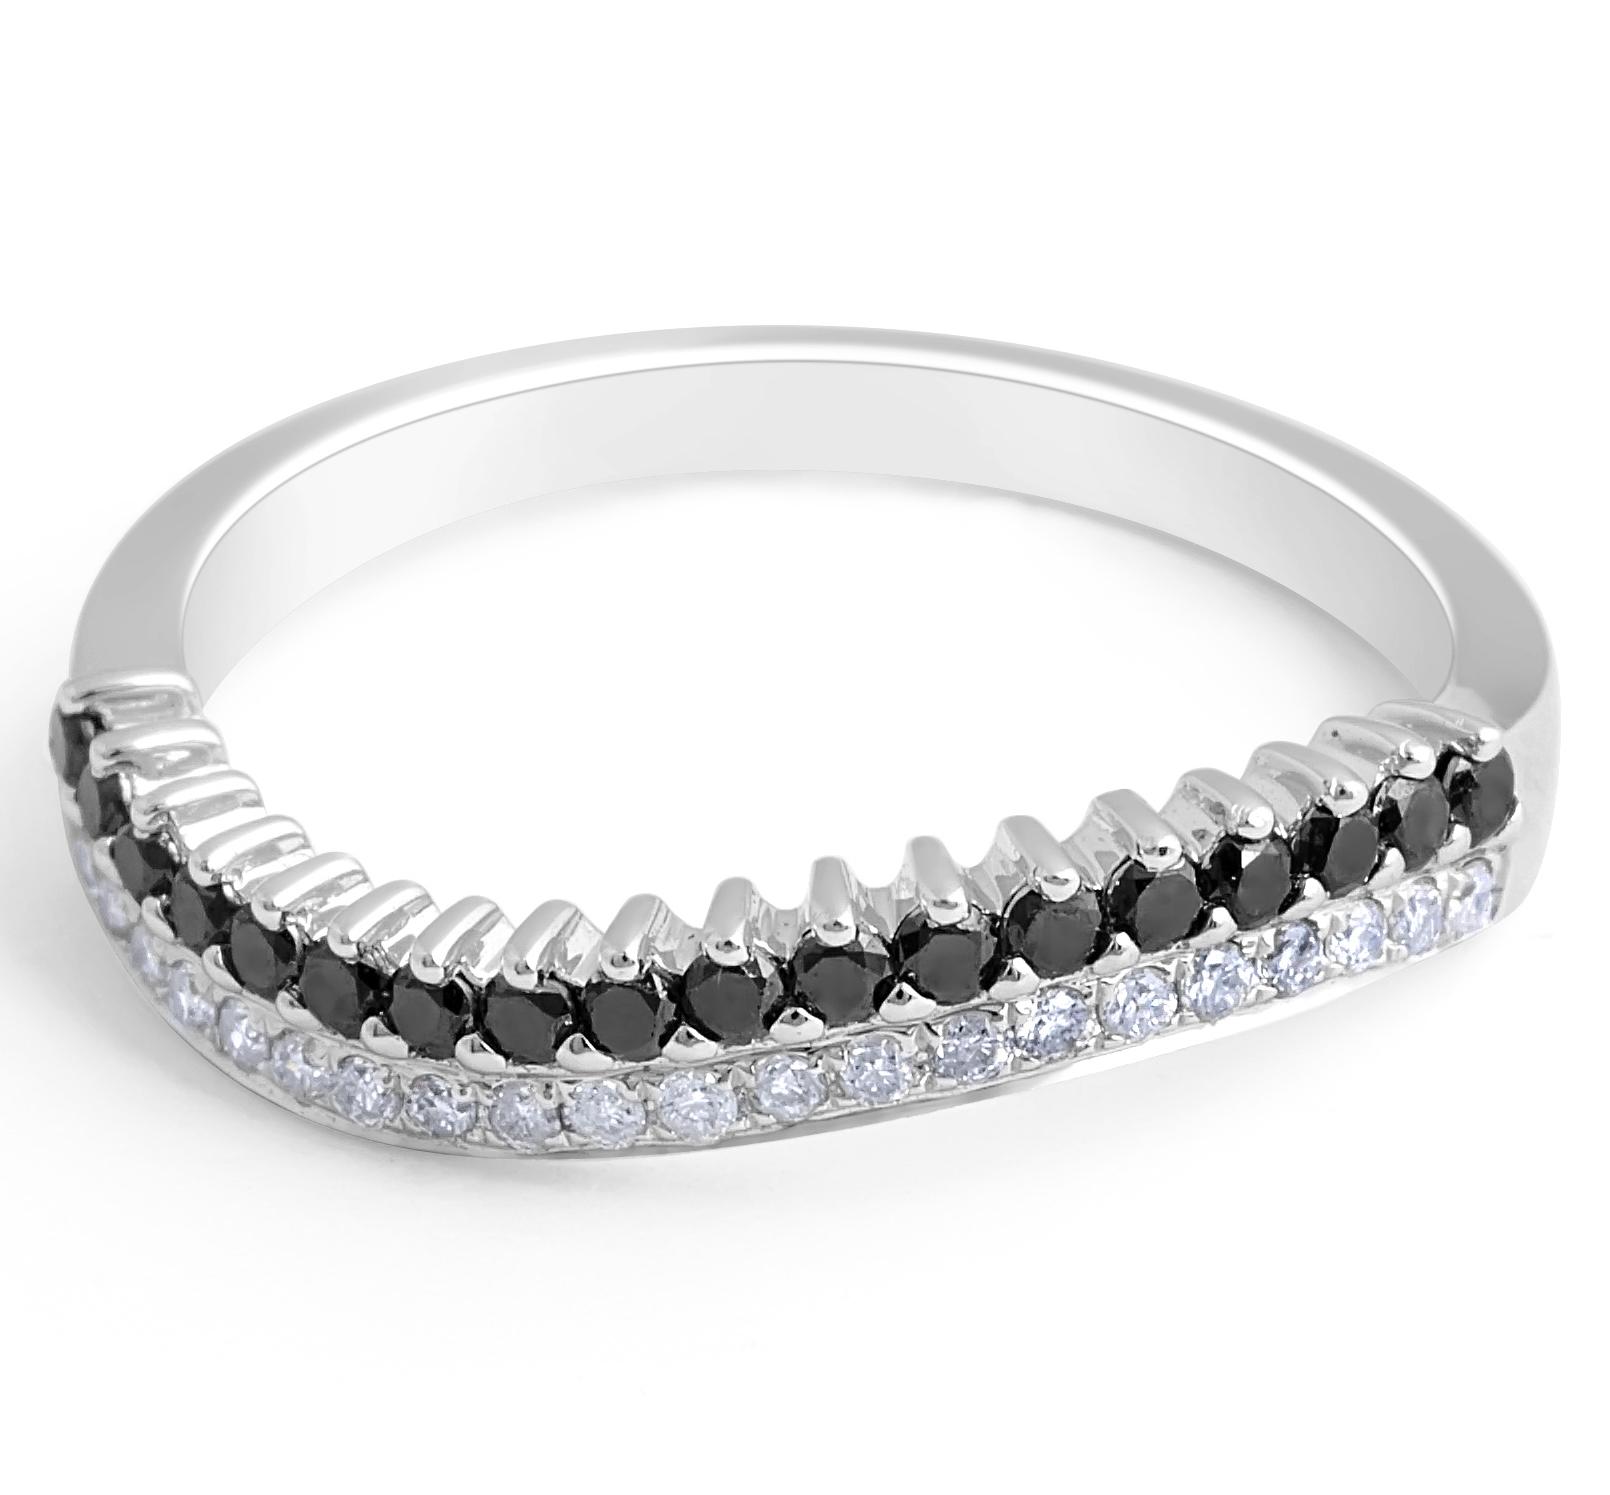 BLACK AND WHITE DIAMOND WEDDING BAND IN 18 KARAT WHITE GOLD